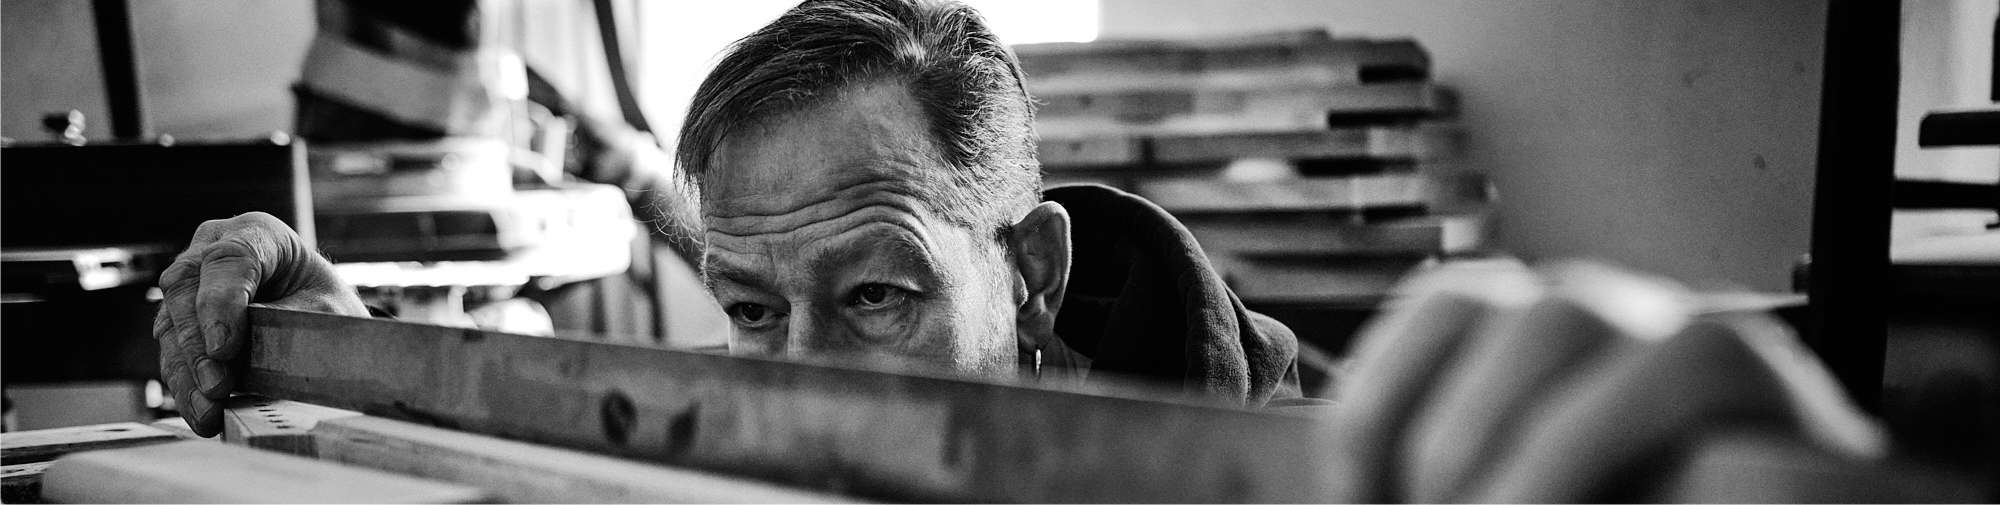 Luthier Thomas Harm | Cyanguitars